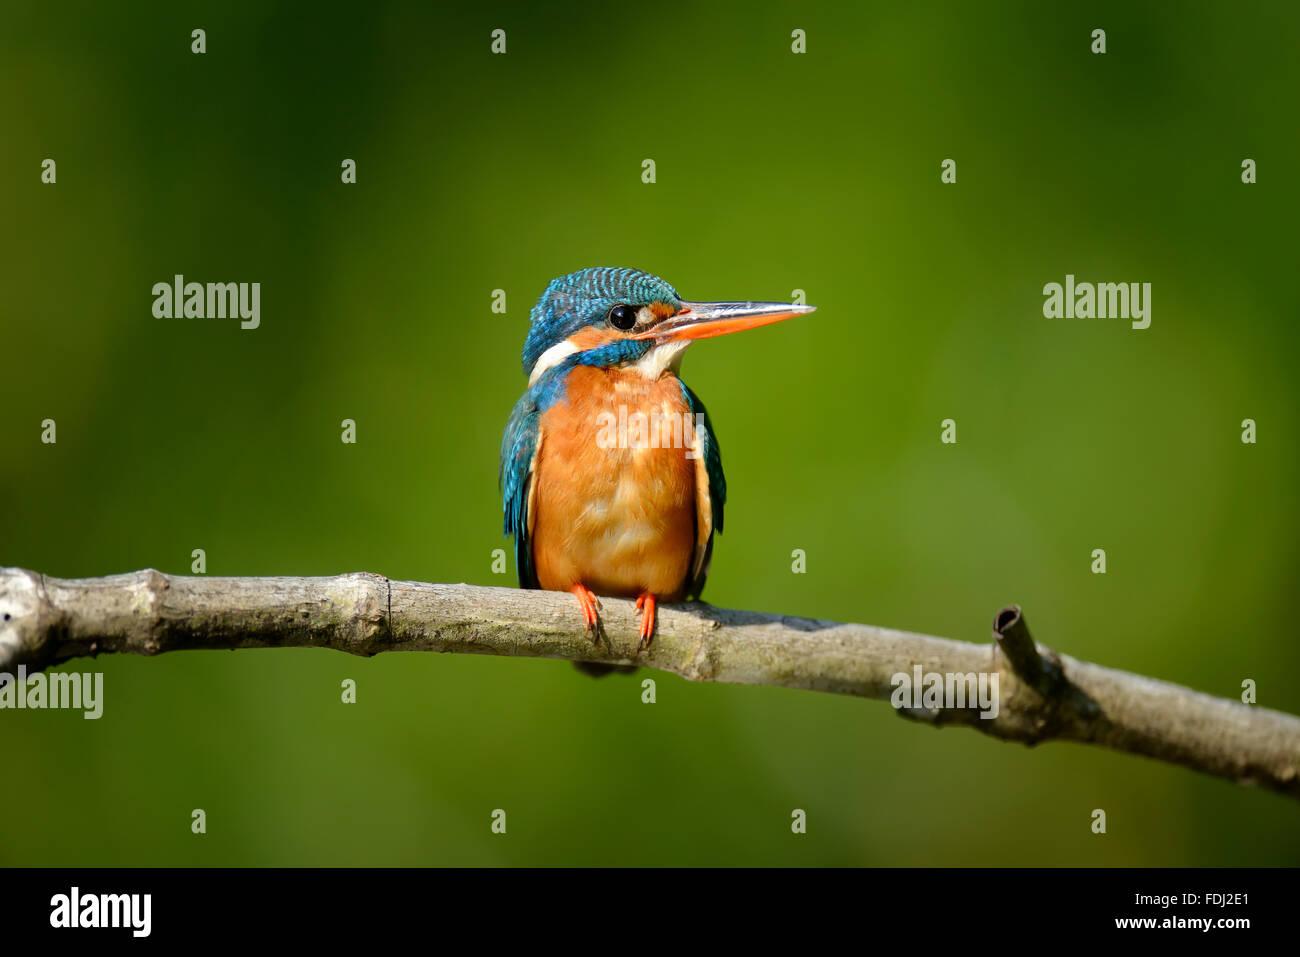 Beautiful blue Kingfisher bird on a branch - Stock Image